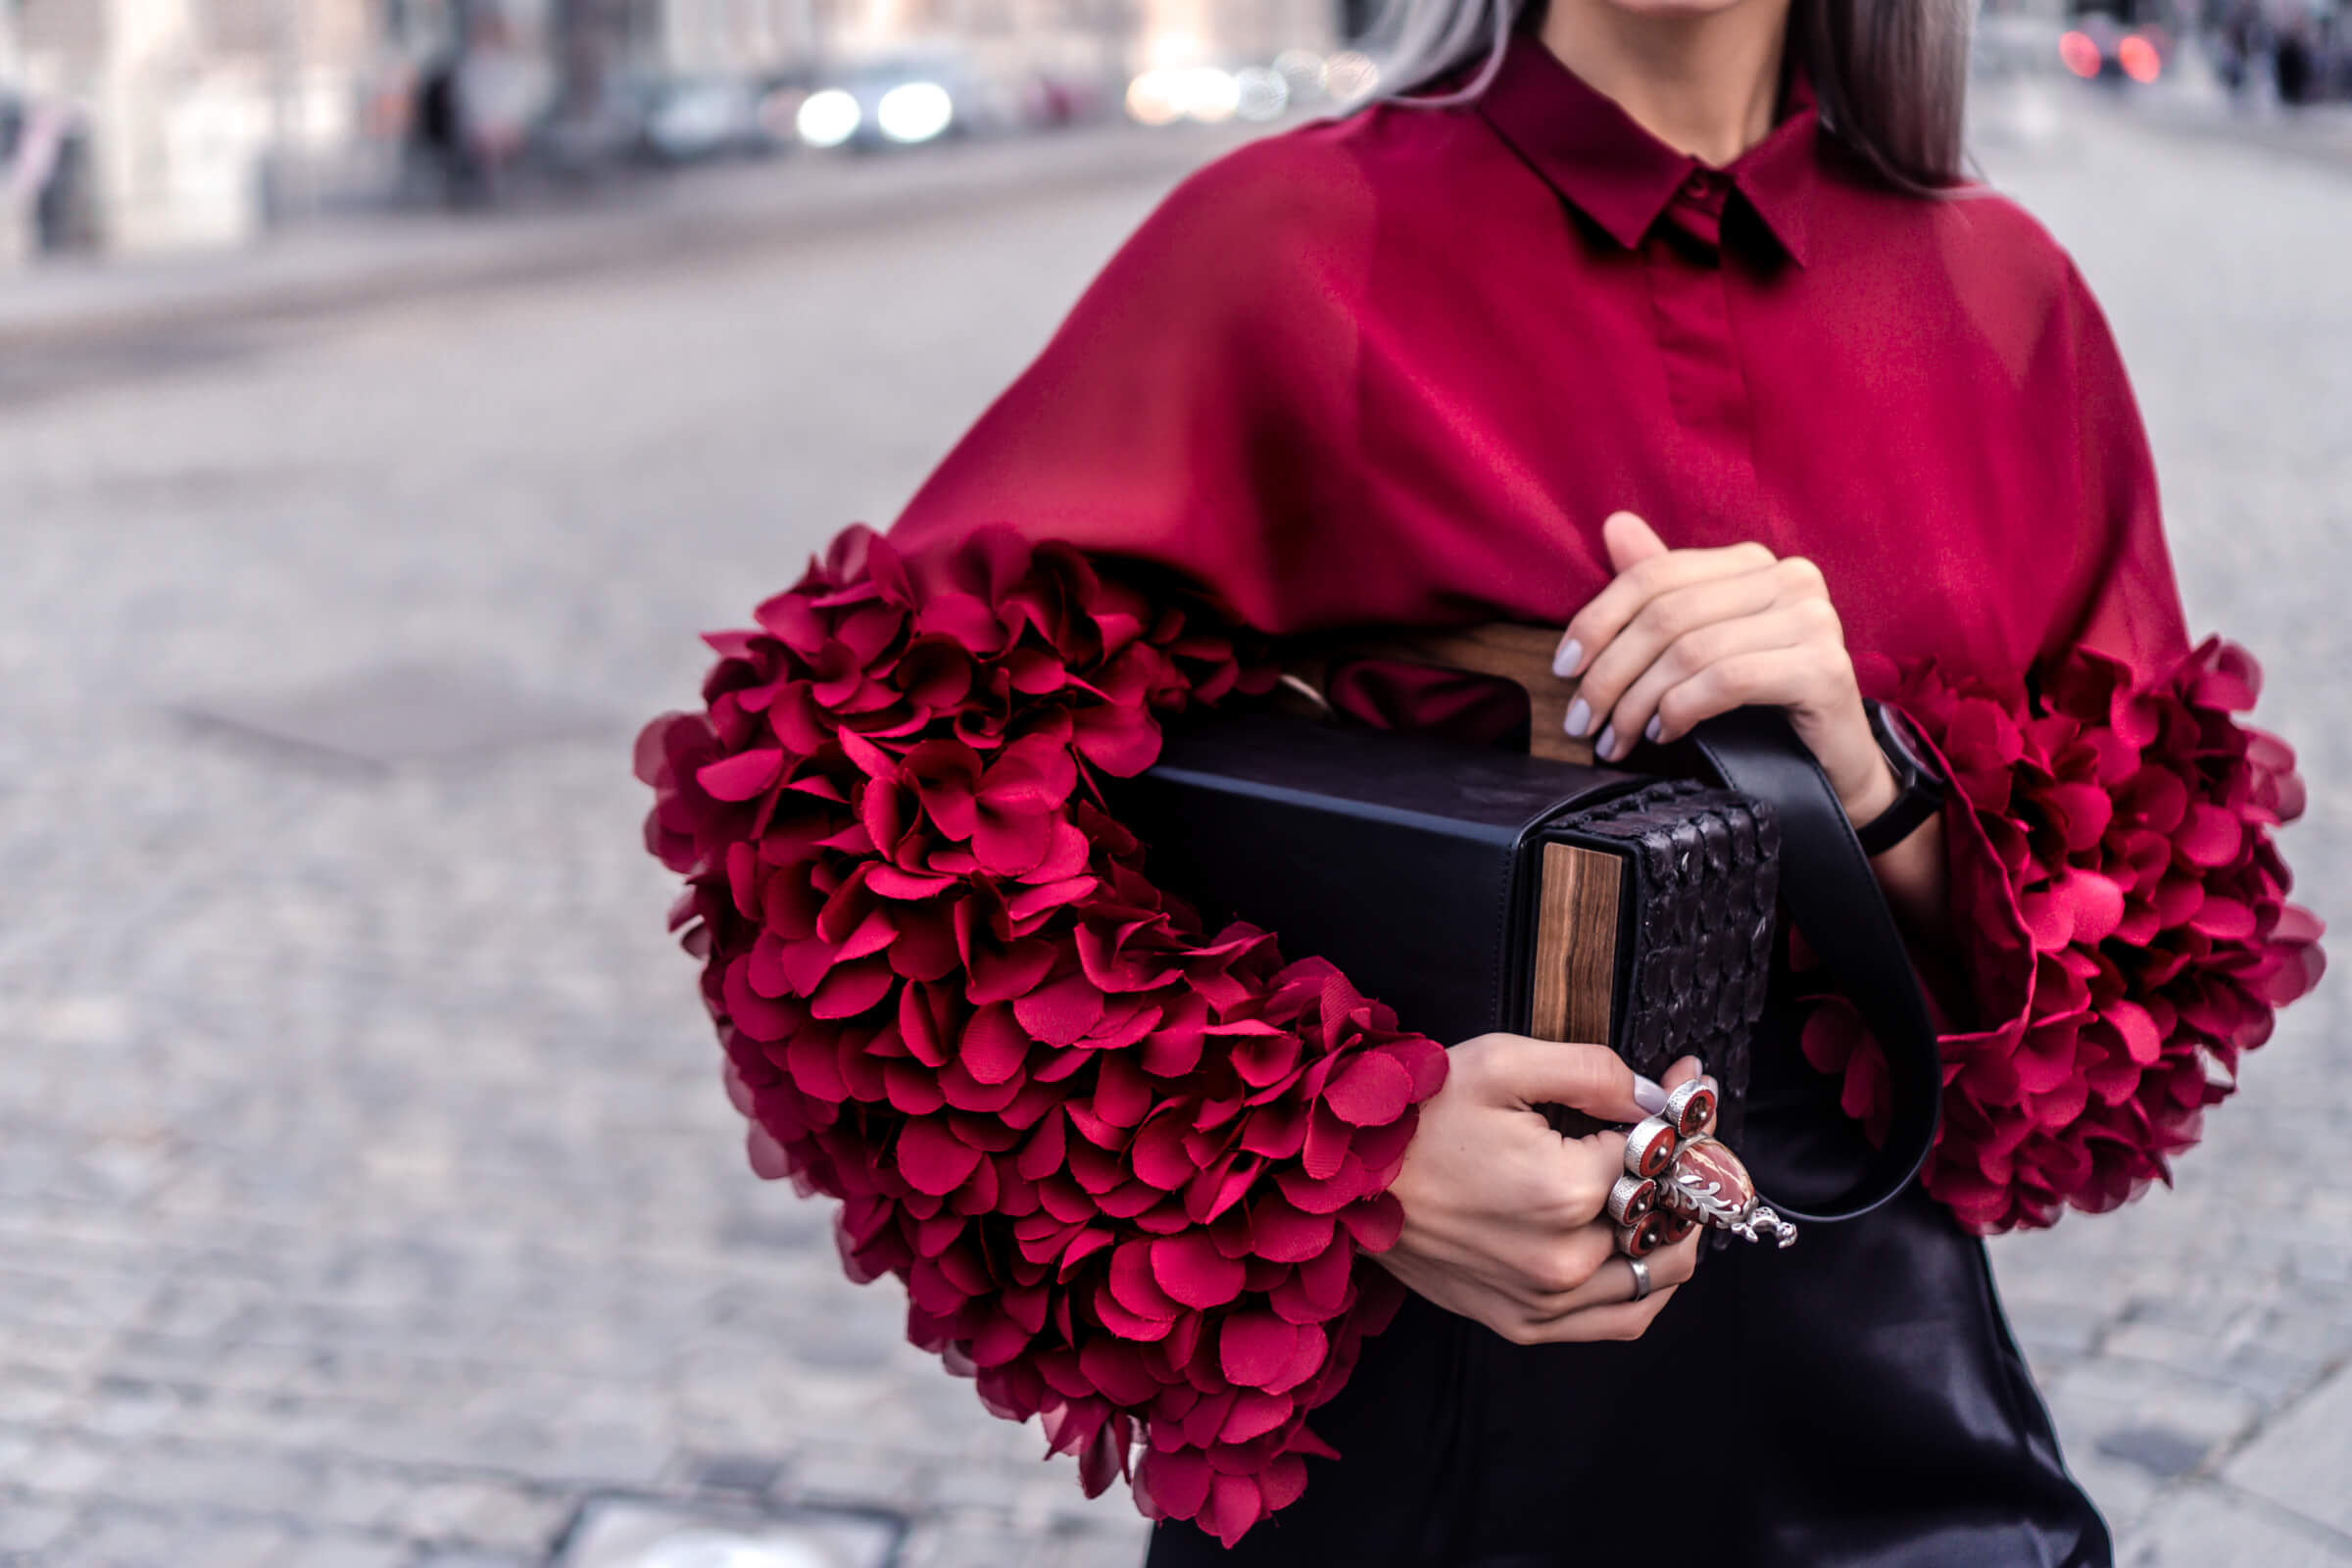 Georgische Mode erobert Europa und Wien